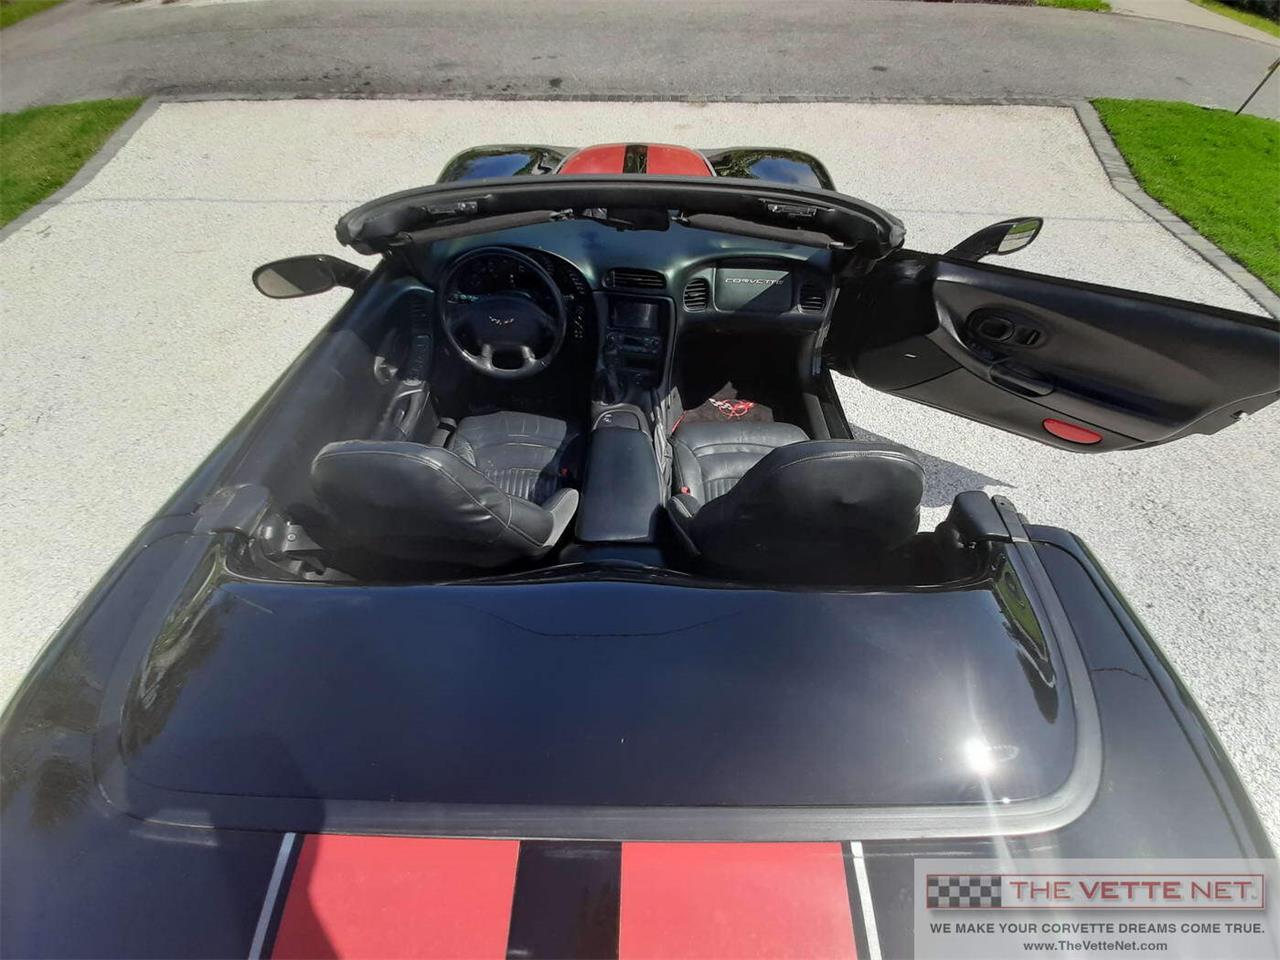 1998 Chevrolet Corvette (CC-1418811) for sale in Sarasota, Florida